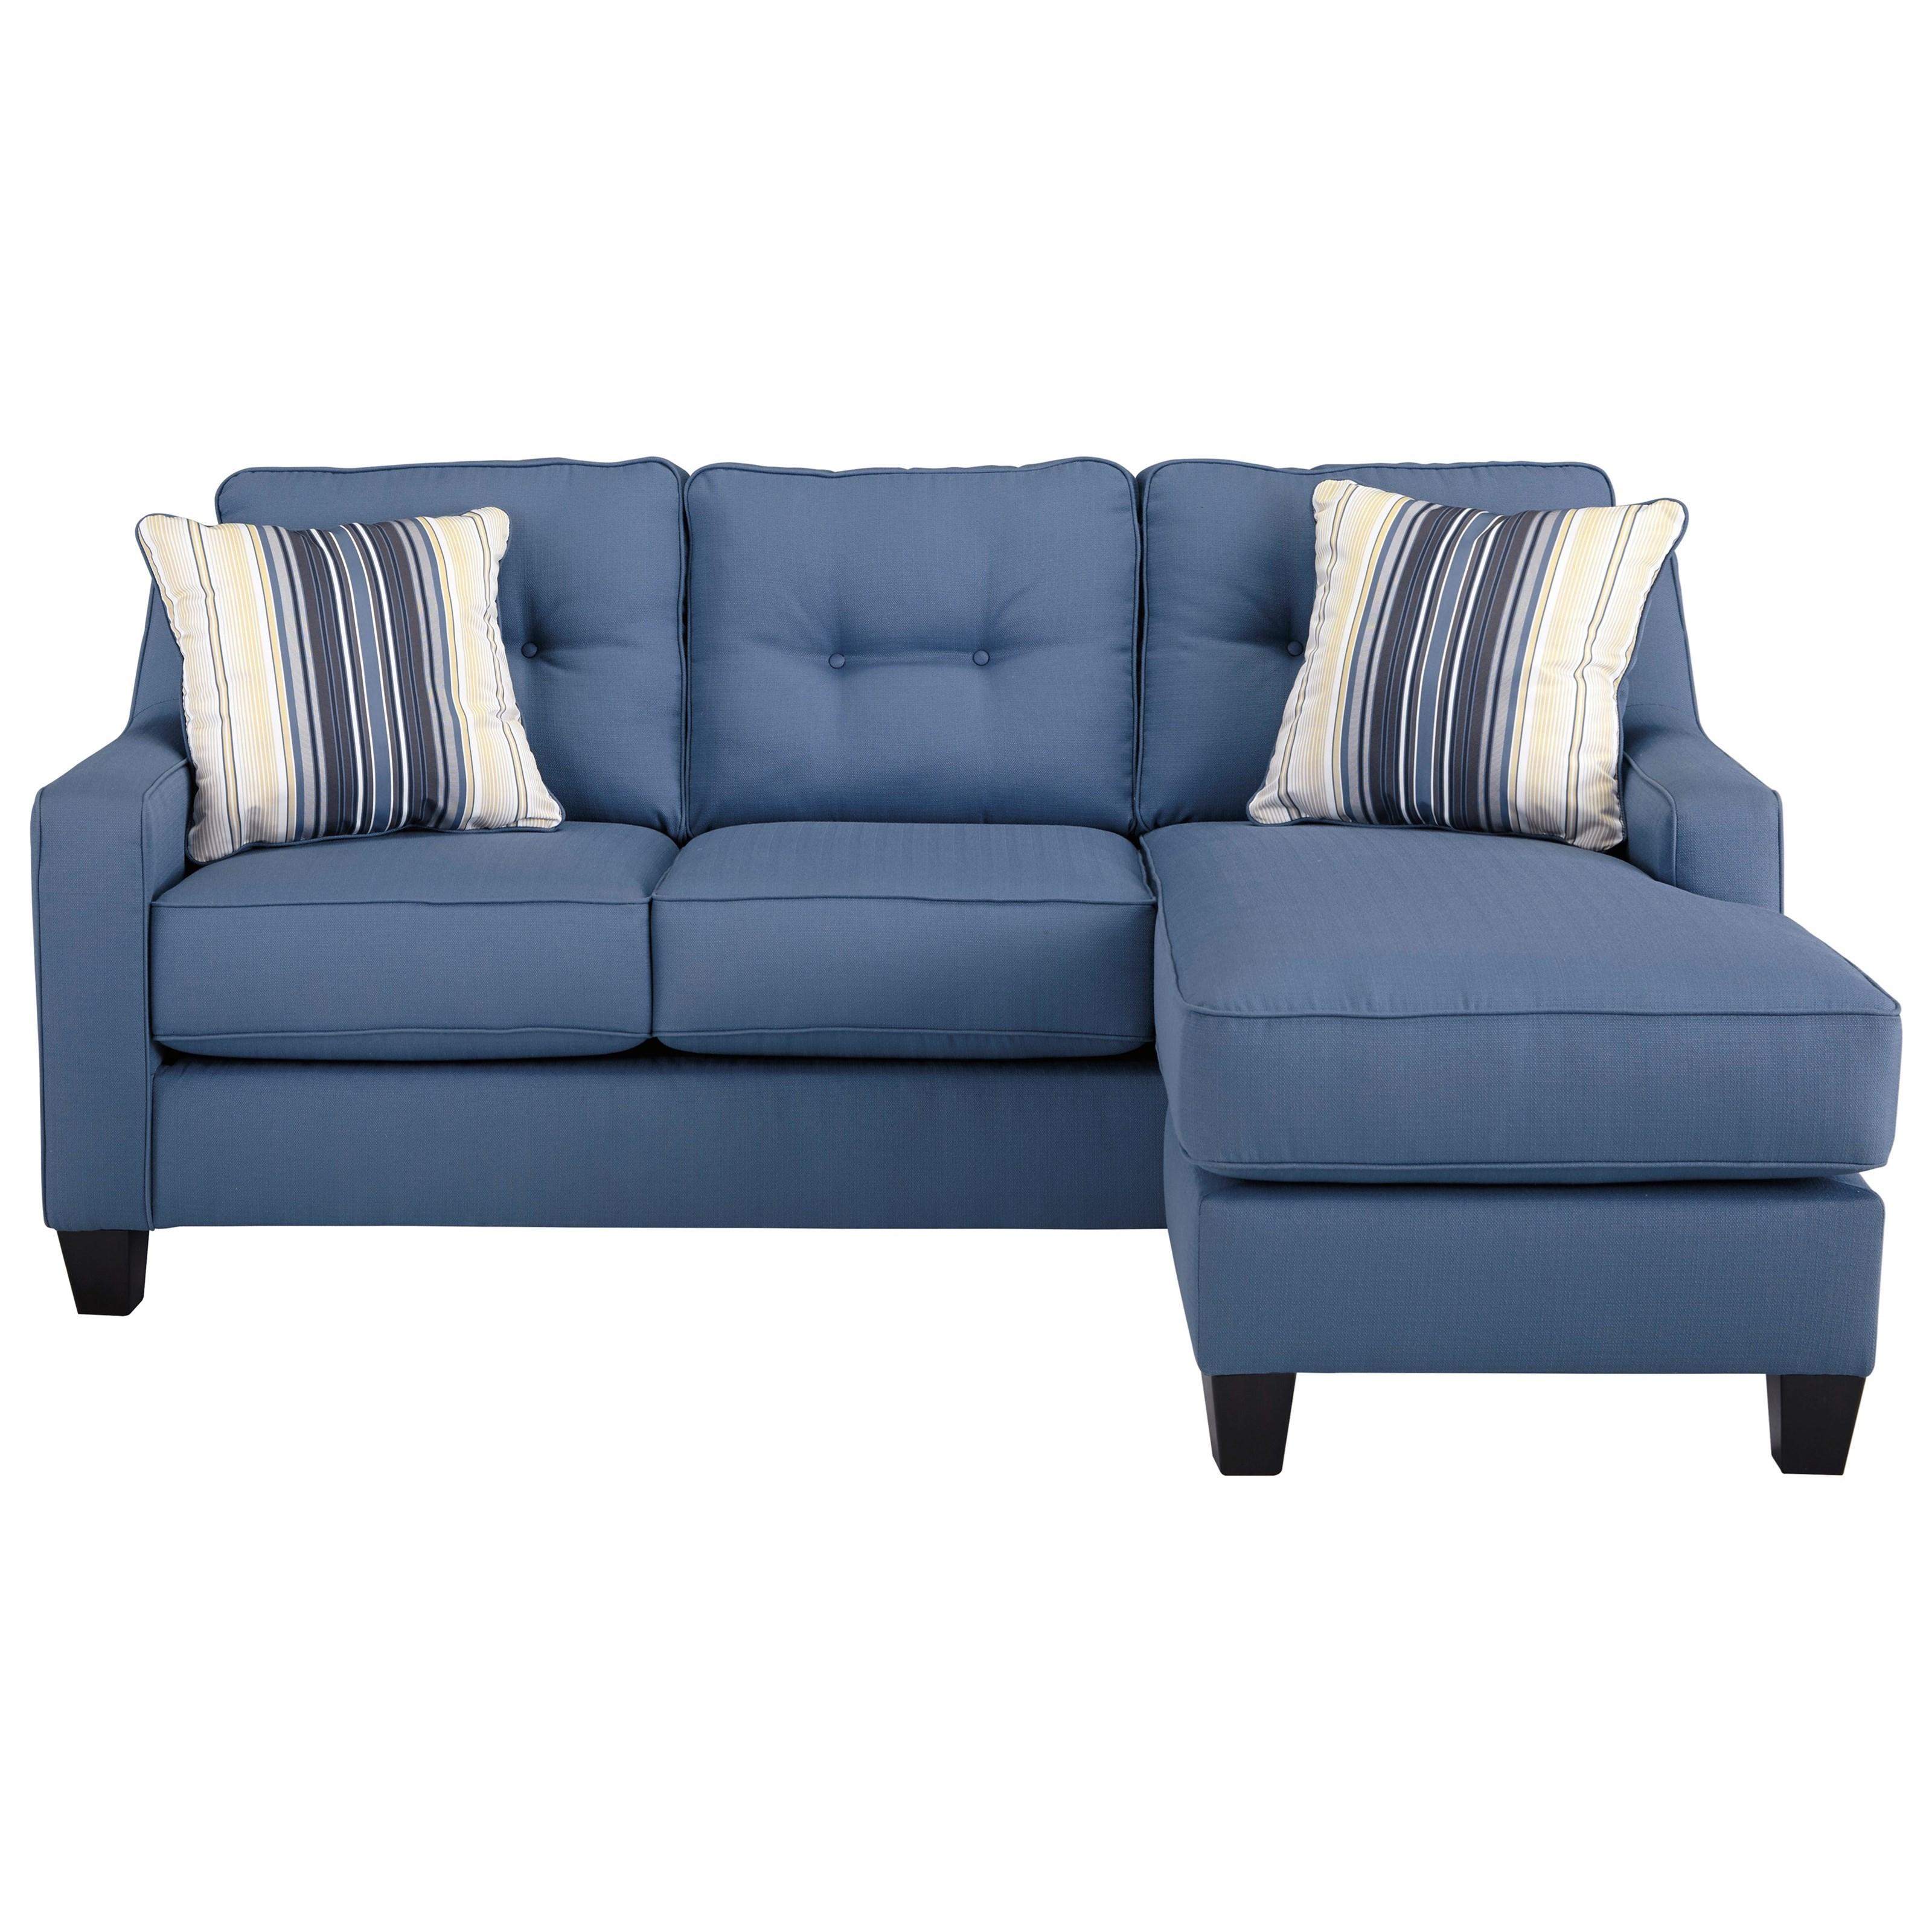 sleeper sofa chaise photo - 6